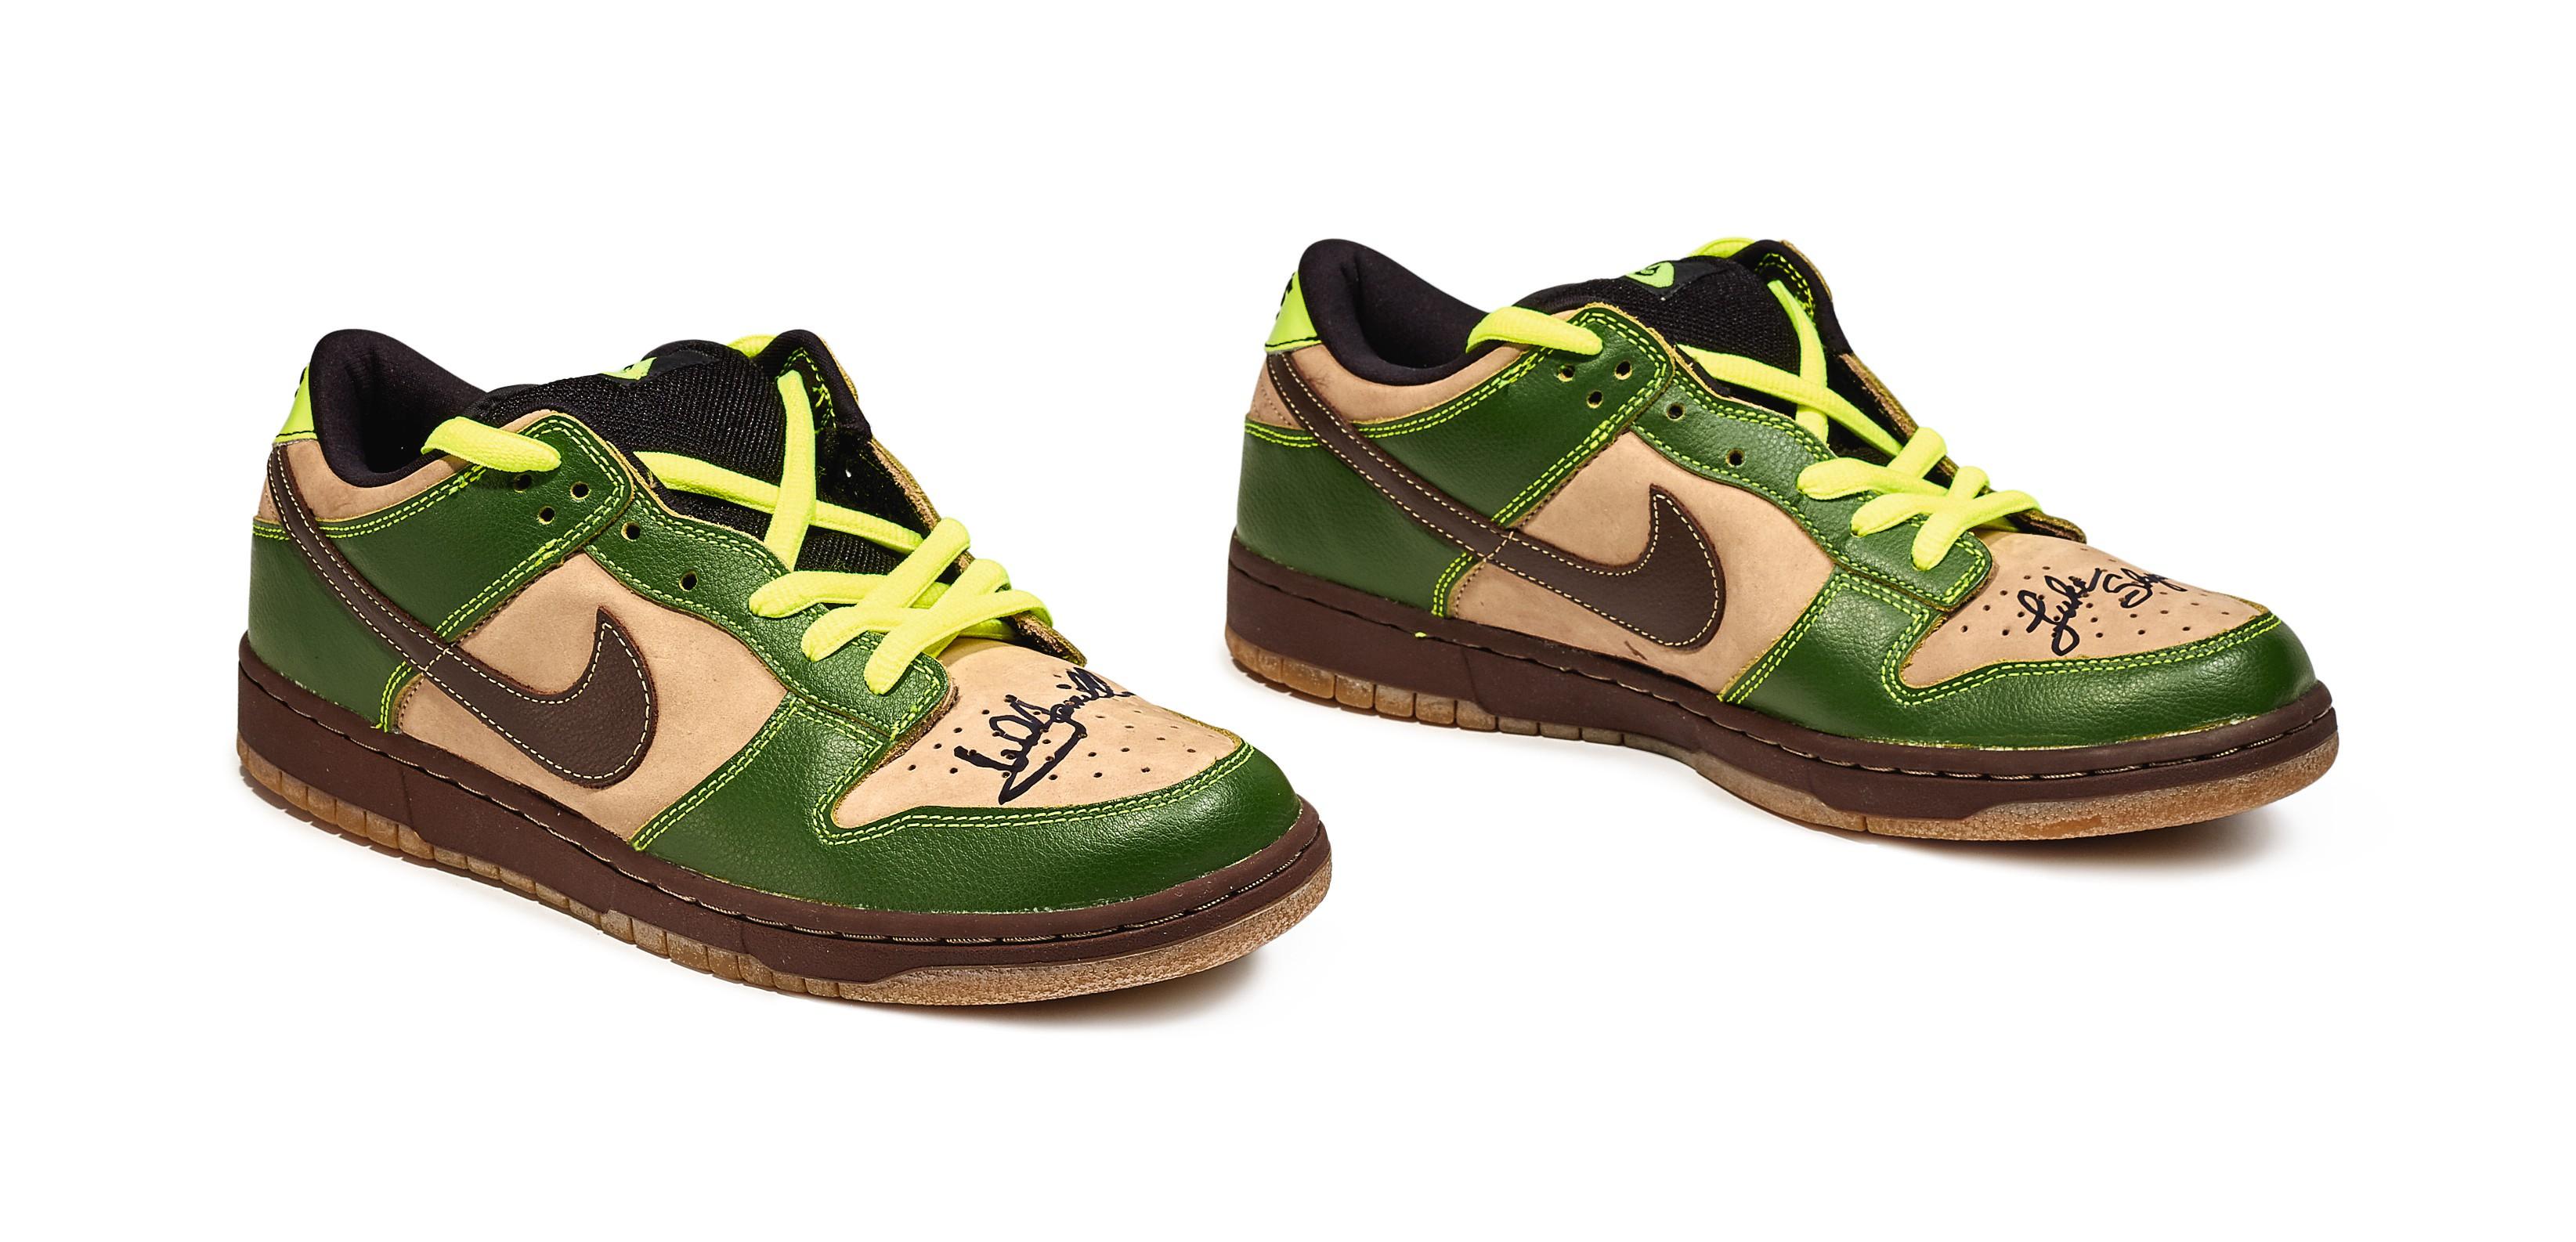 Nike Dunk SB Low 'Jedi' | 2004 | Signed